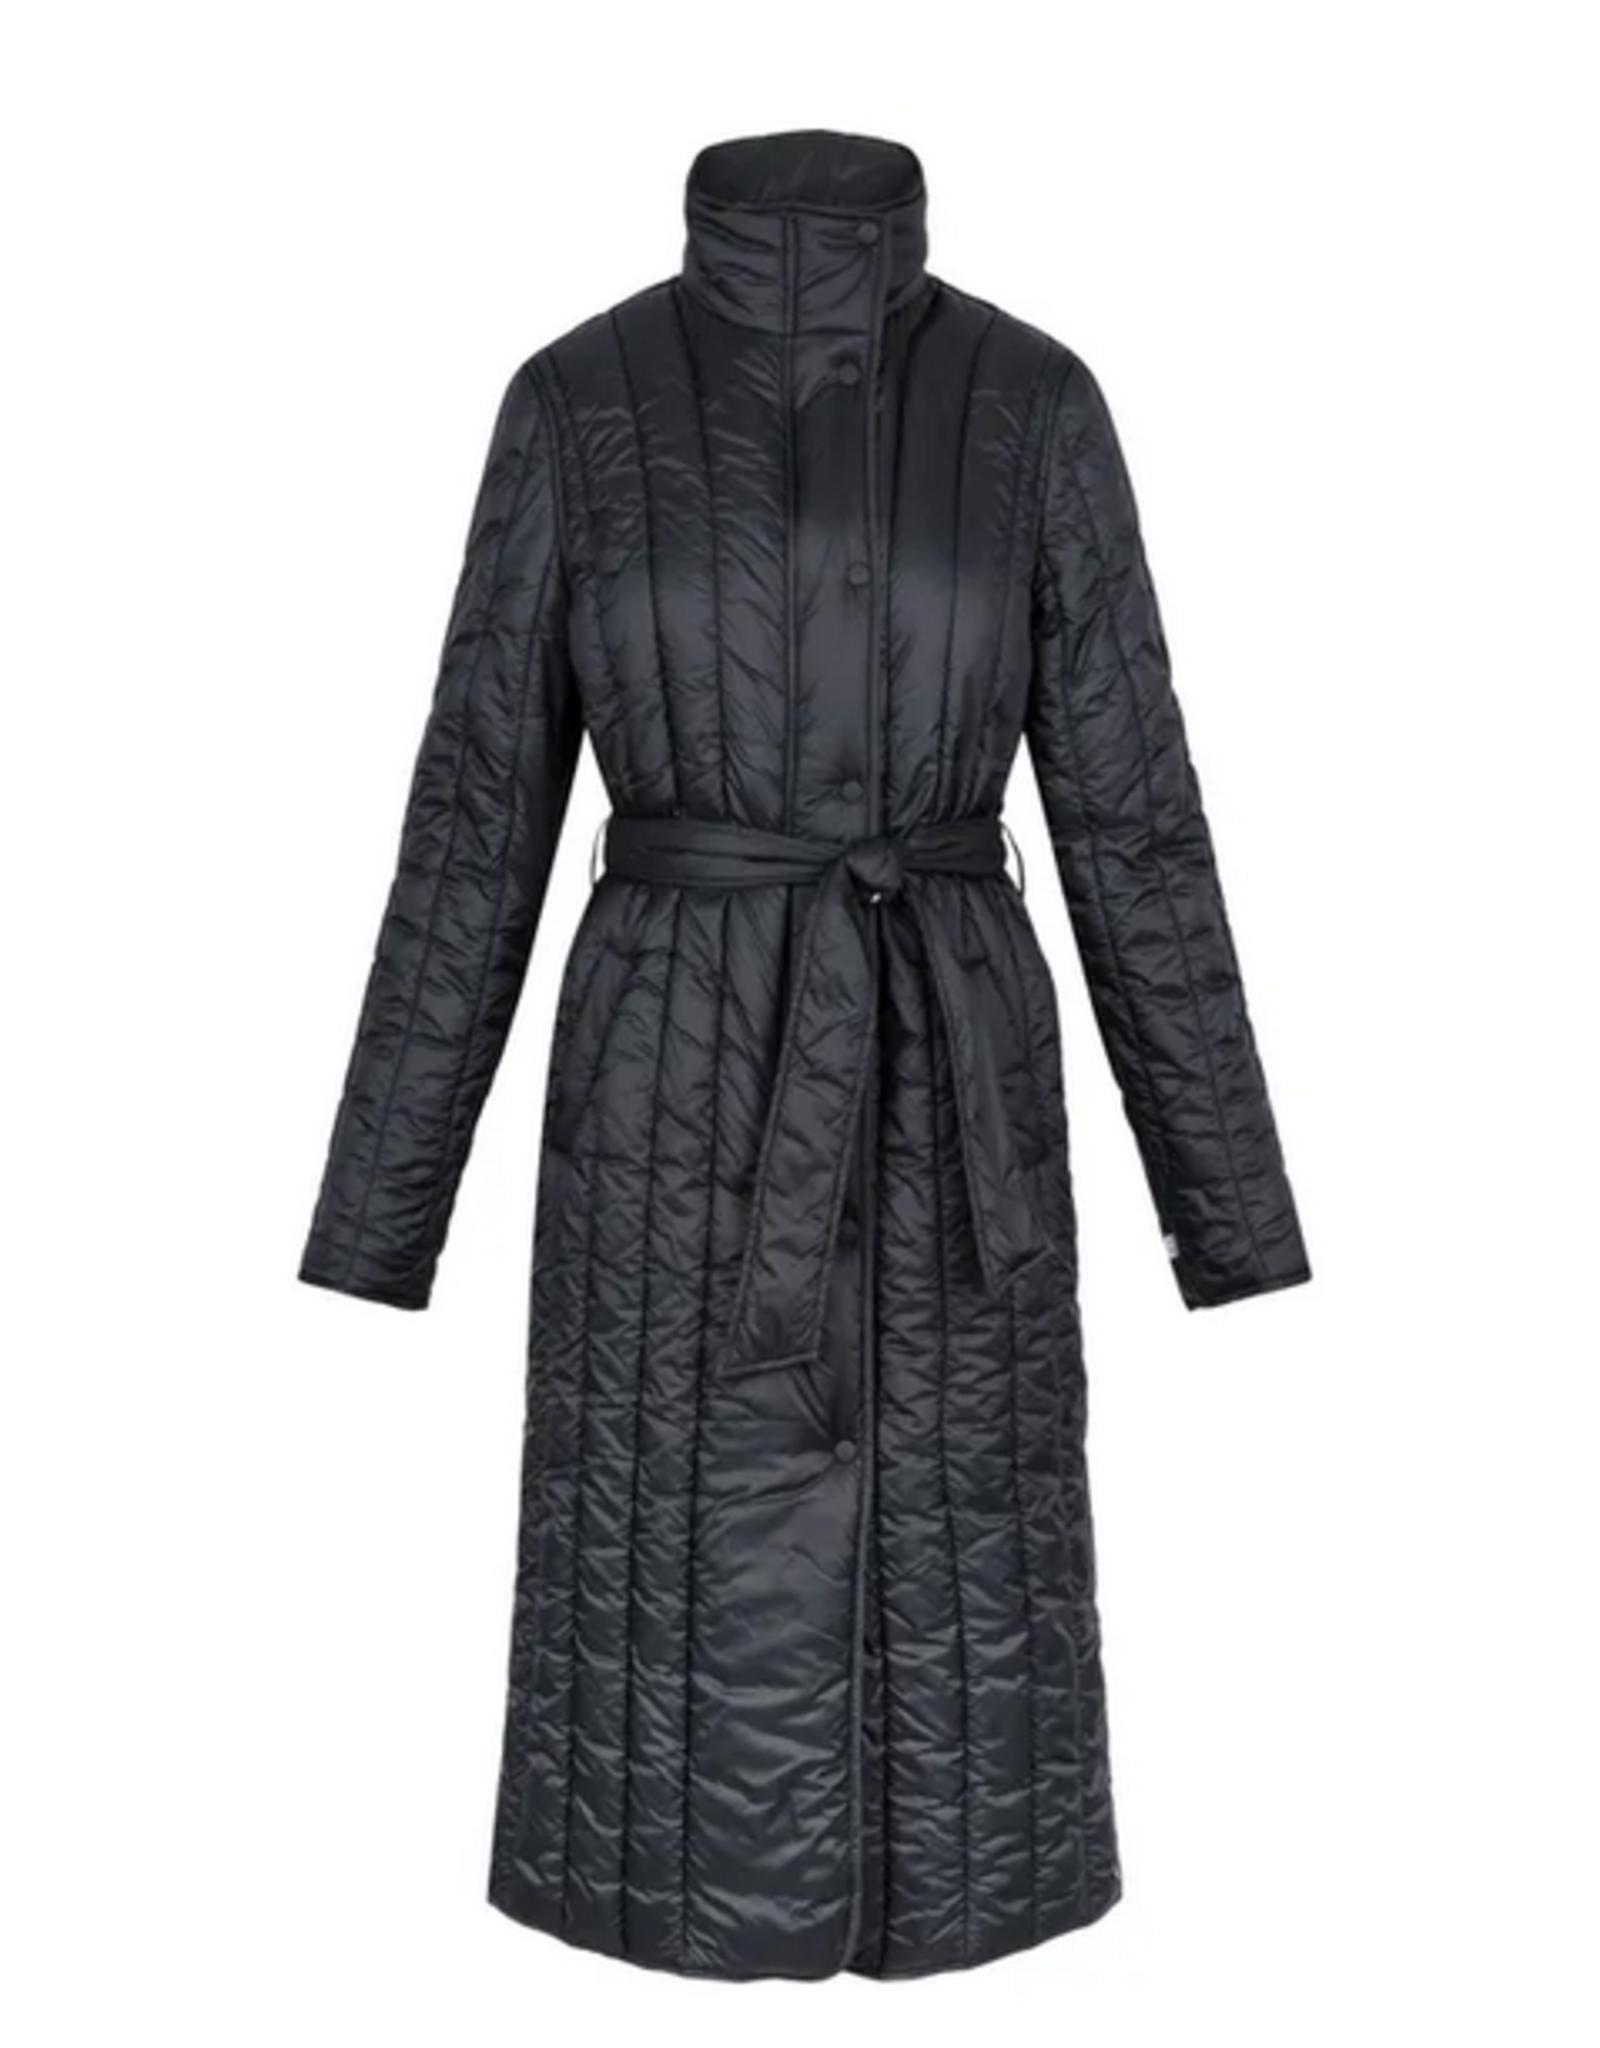 Zusss Zusss - Gewatteerde winterjas - Zwart